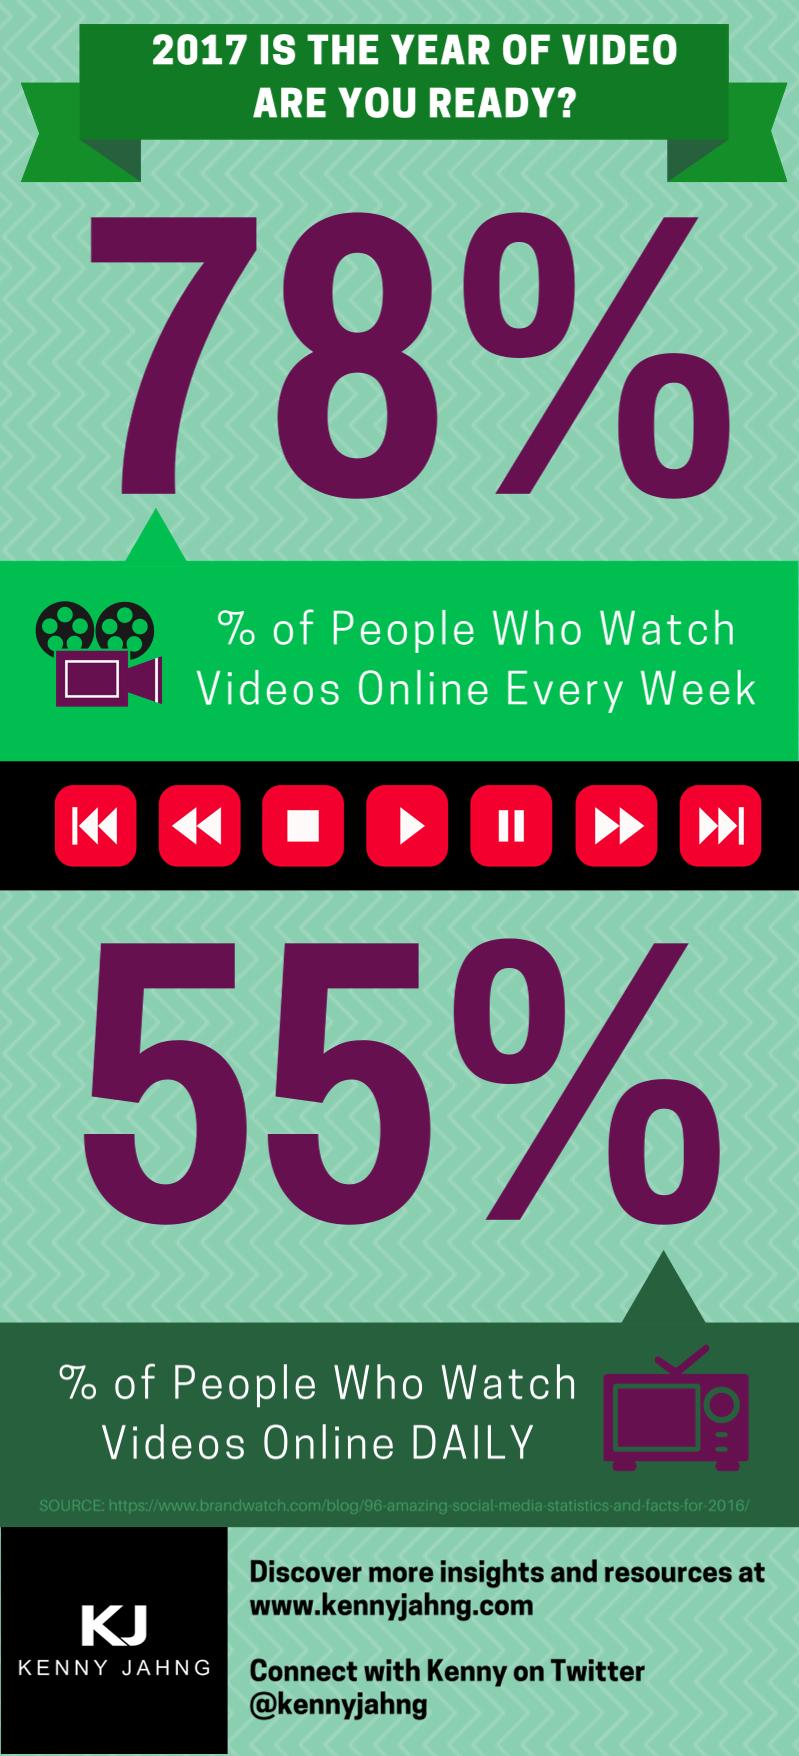 Video Usage Statistics 2017